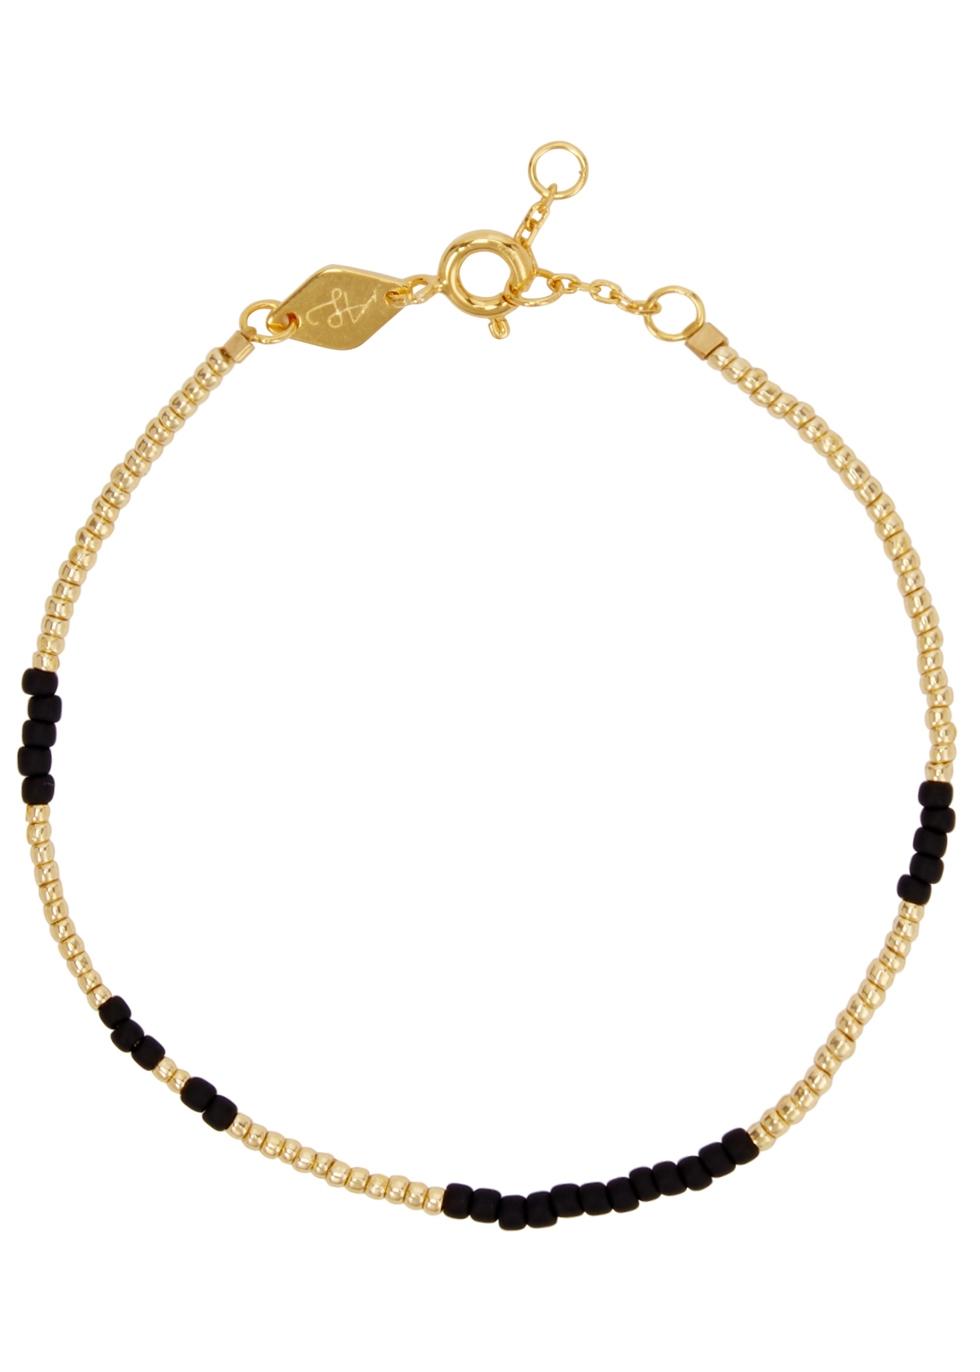 ANNI LU ASYM 18CT GOLD-PLATED BEADED BRACELET